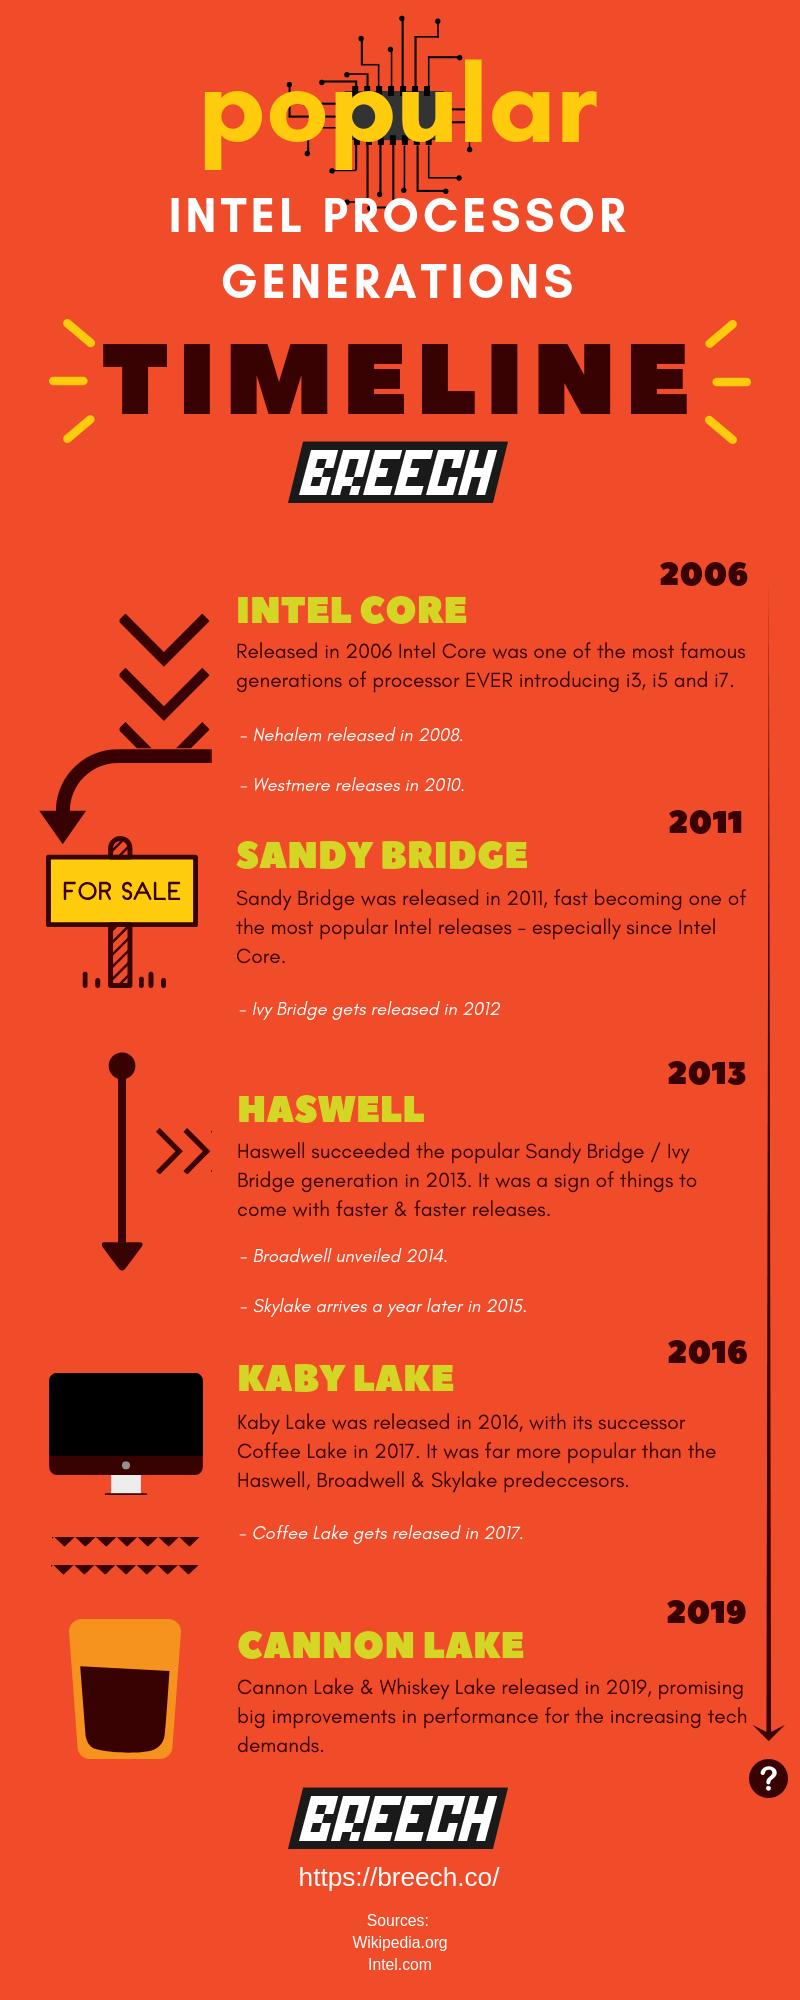 intel-processor-generation-infographic-plaza